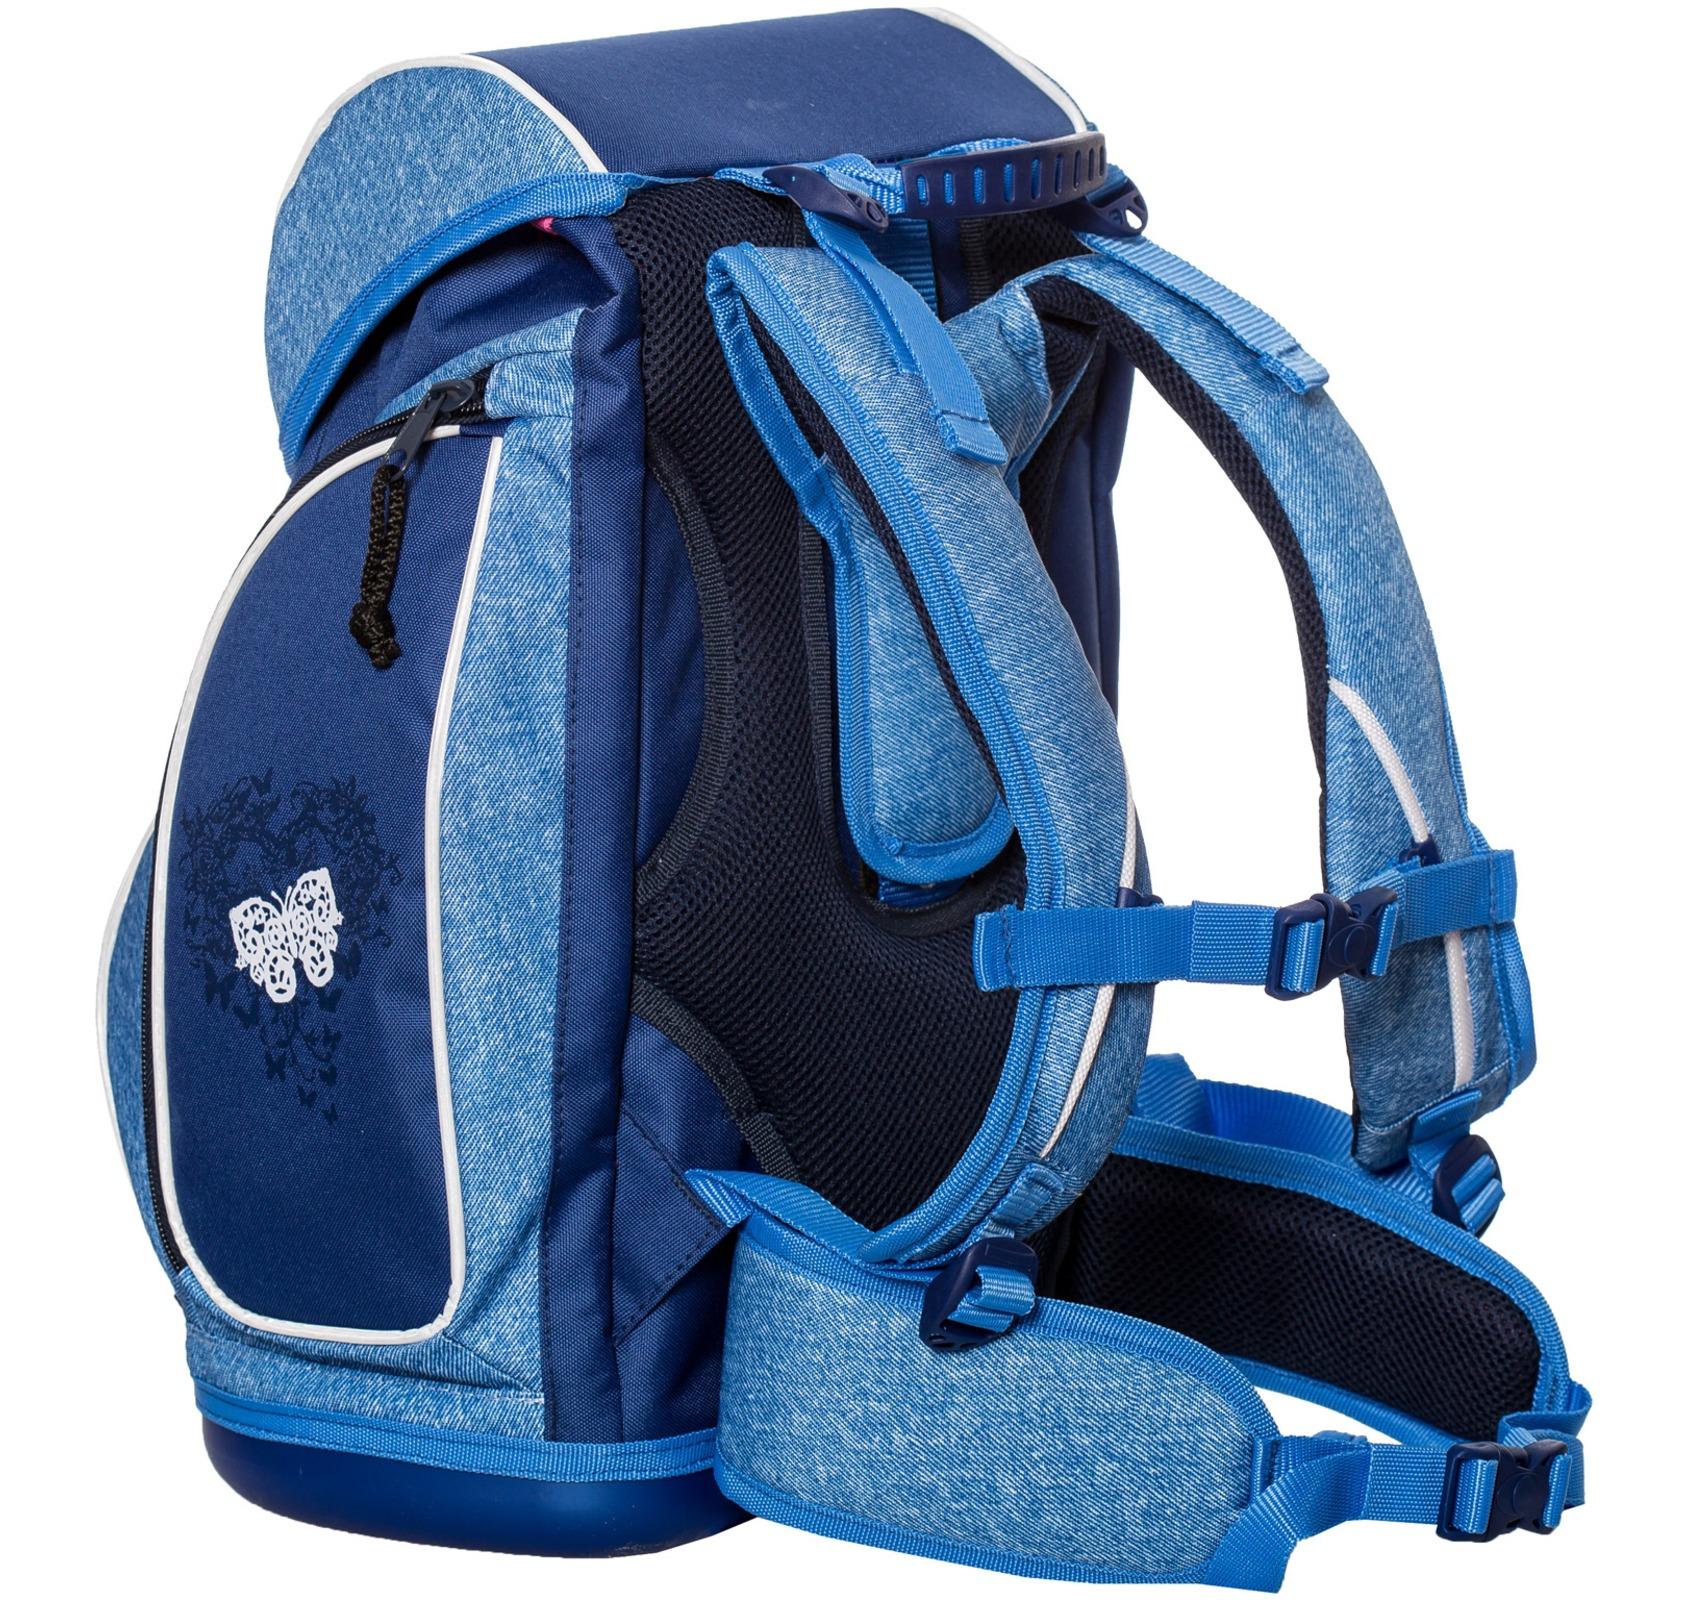 Ранец-рюкзак Belmil 404-31/467 цвет Butterfly Новинка, - фото 5